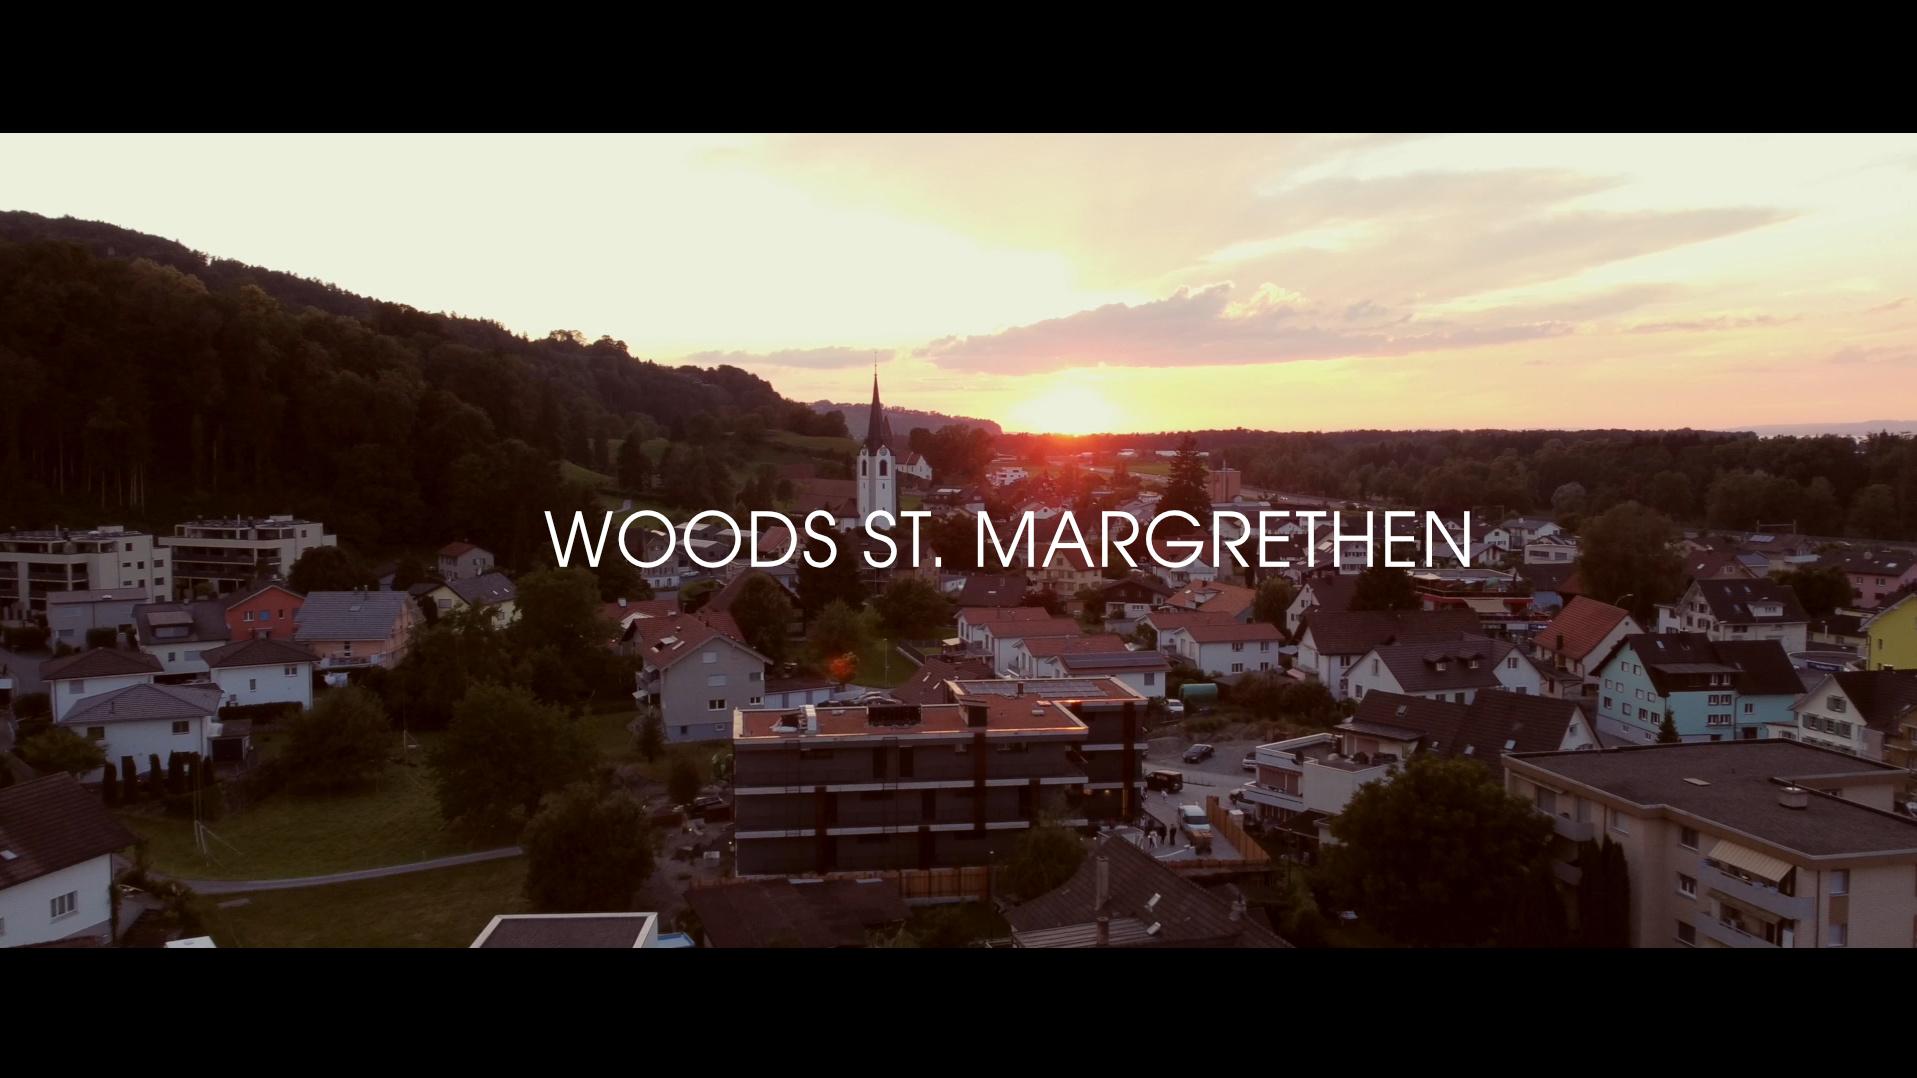 woods St. Margrethen